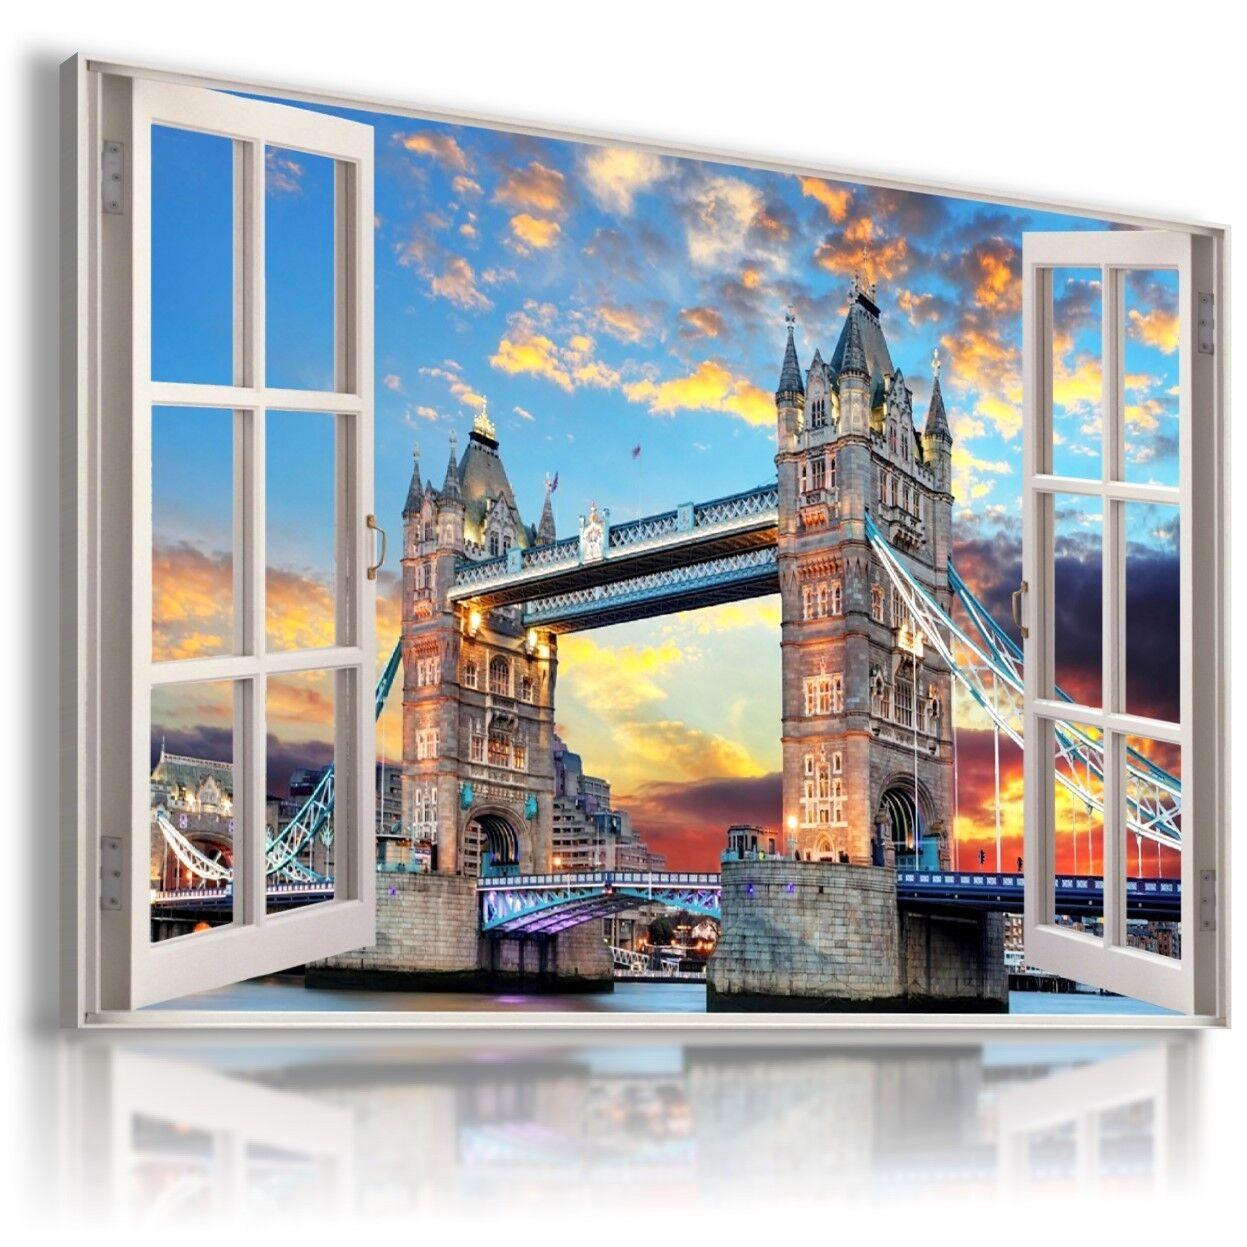 Londra Tower Bridge TAMIGI 3D finestra Vedi foto su tela Wall Art W620 mataga